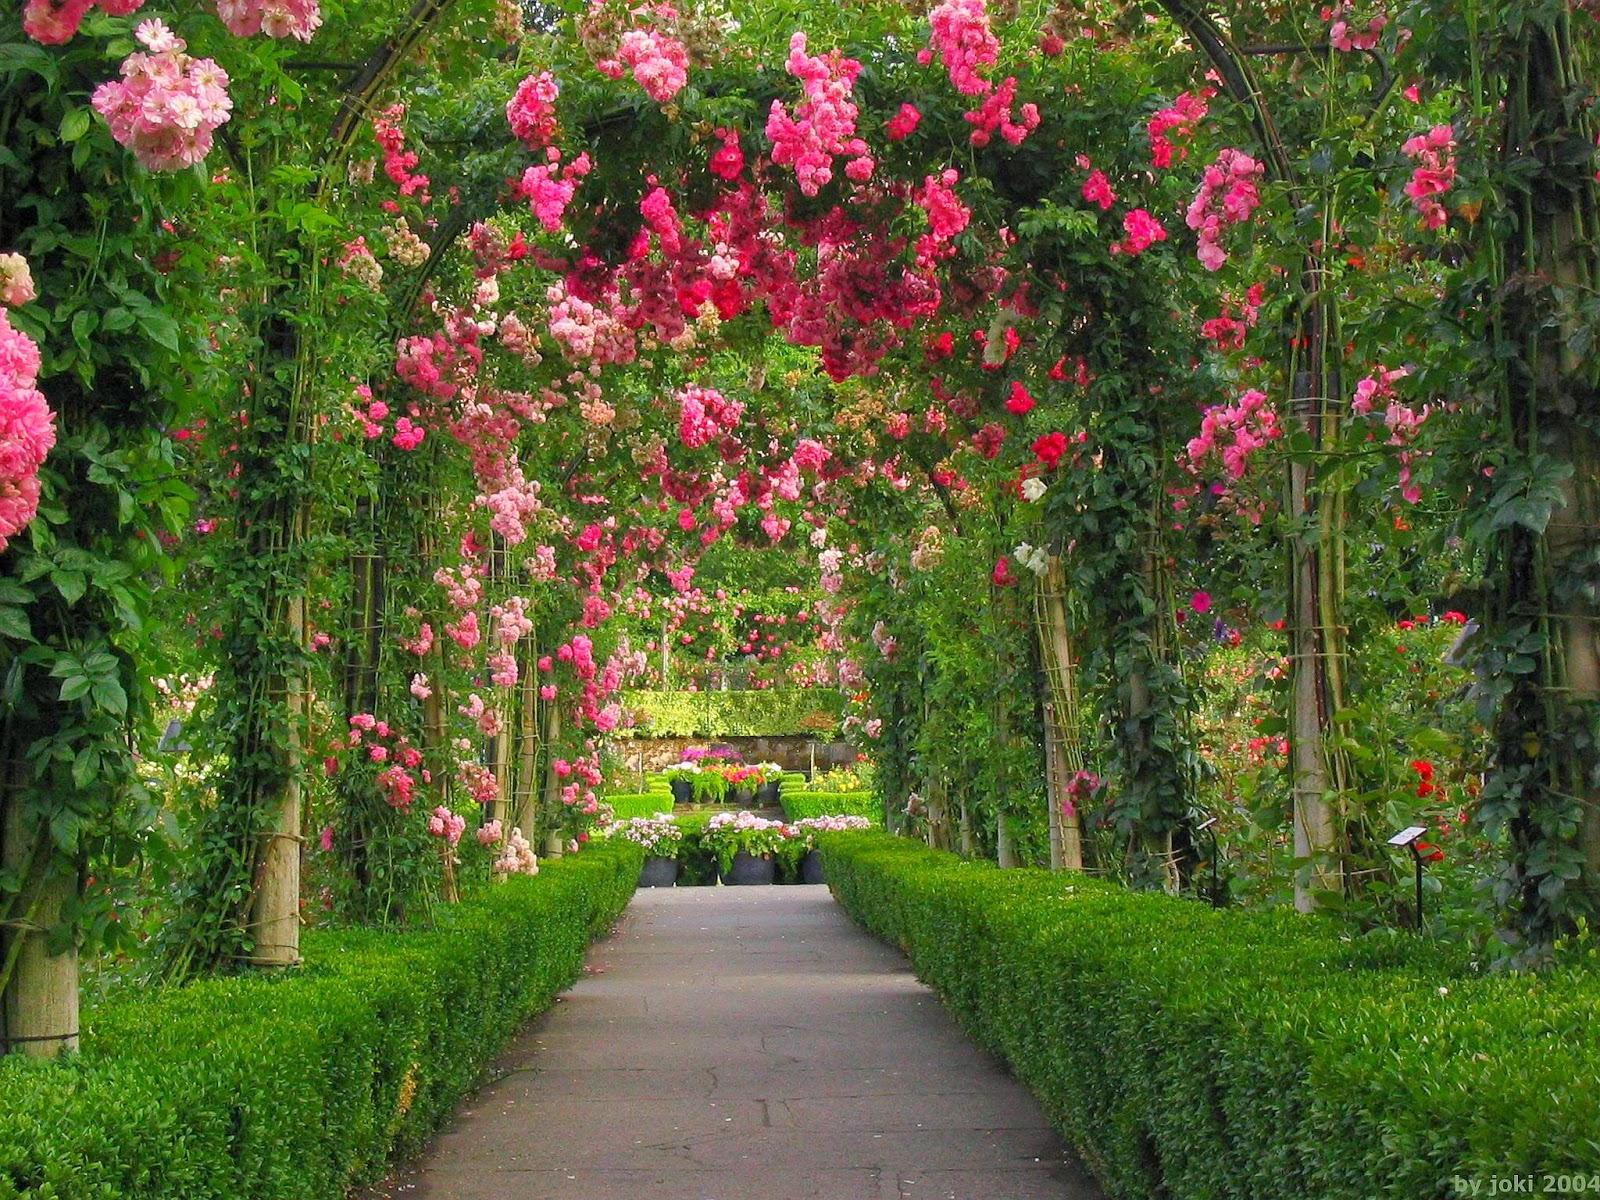 HD Wallpaper Flower Gardens - WallpaperSafari